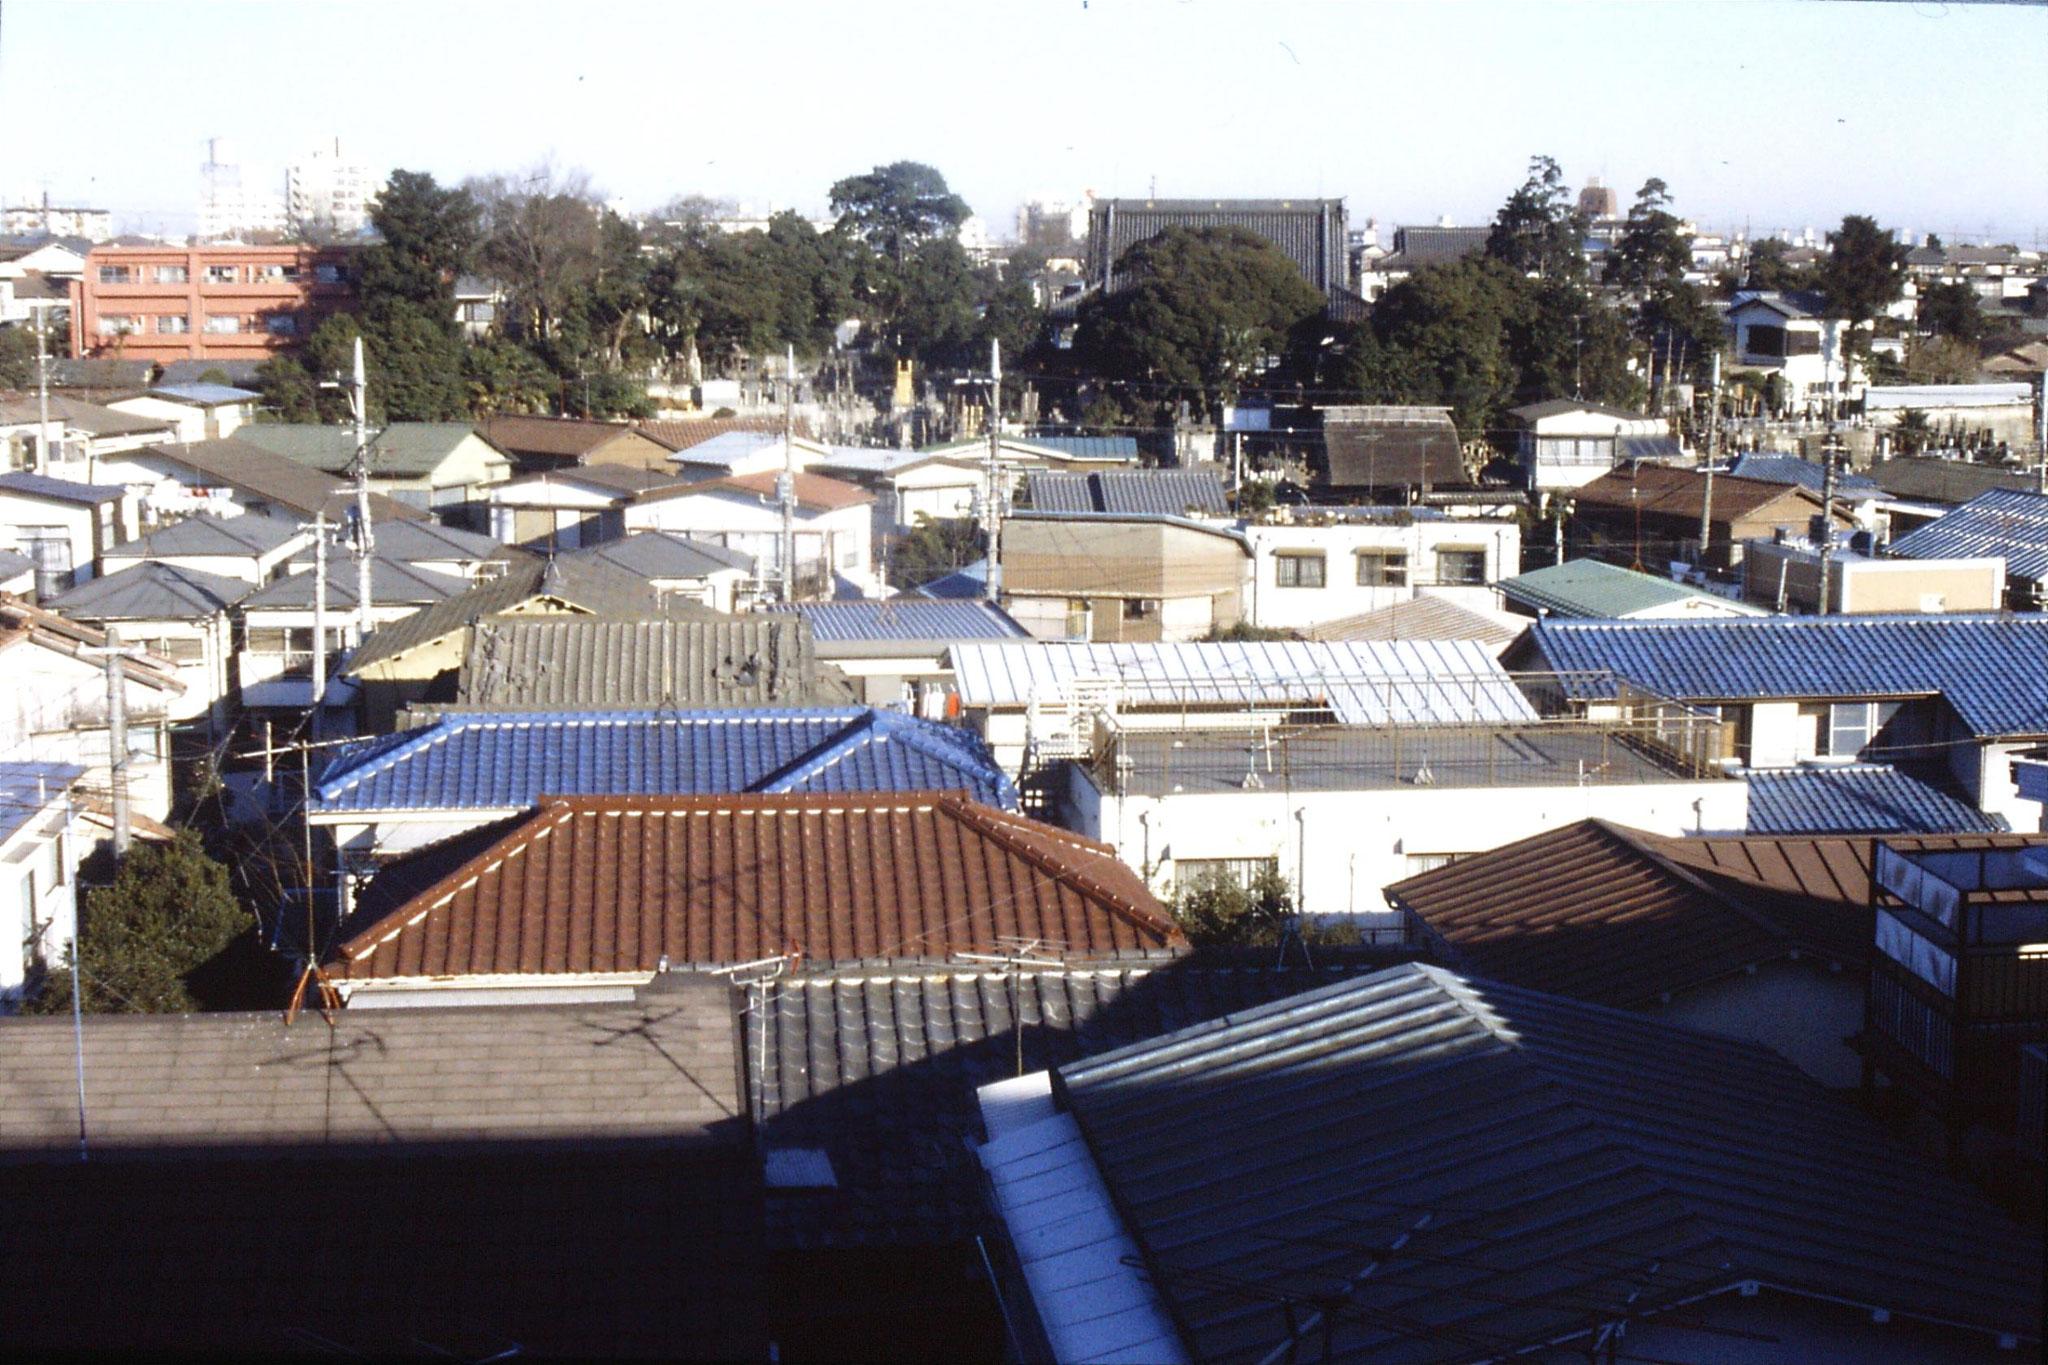 28/12/1988: 21: Tokyo nr Nishimagome